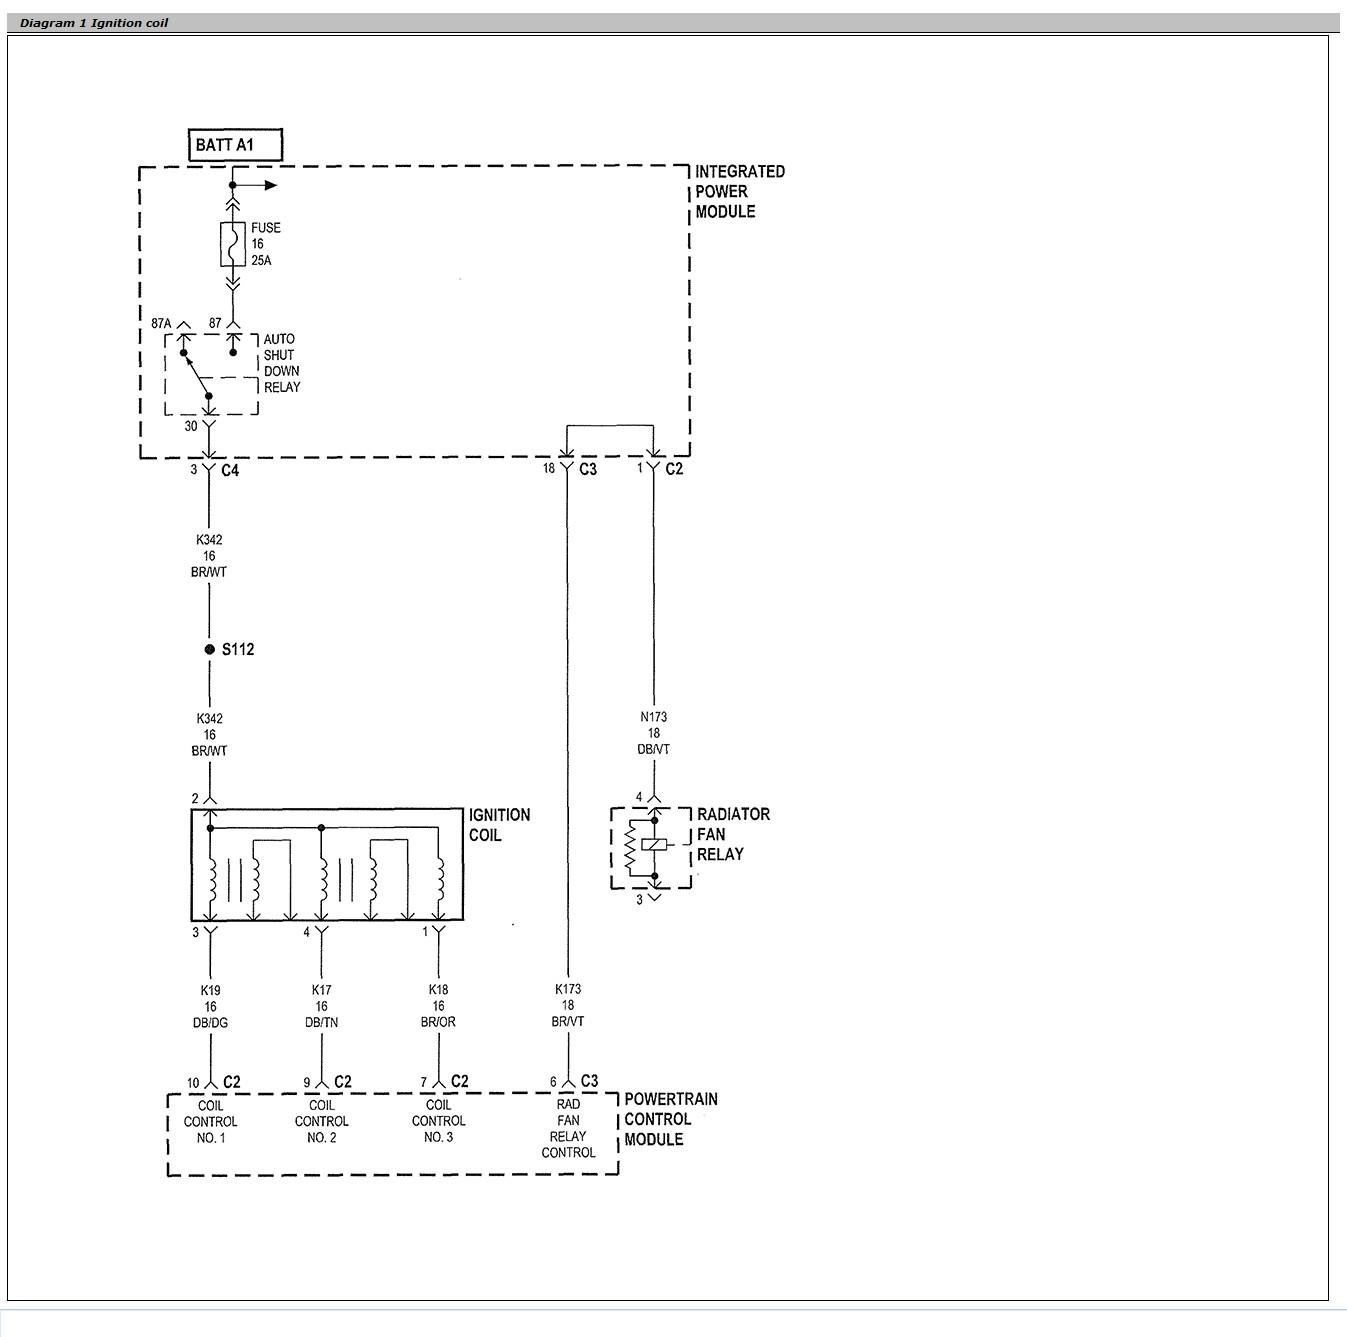 2003 Dodge Caravan Pcm Wiring Diagram Ignition Wiring Diagram Used 03 Grand Caravan Wiring Diagram 03 Dodge Caravan Wiring Diagram